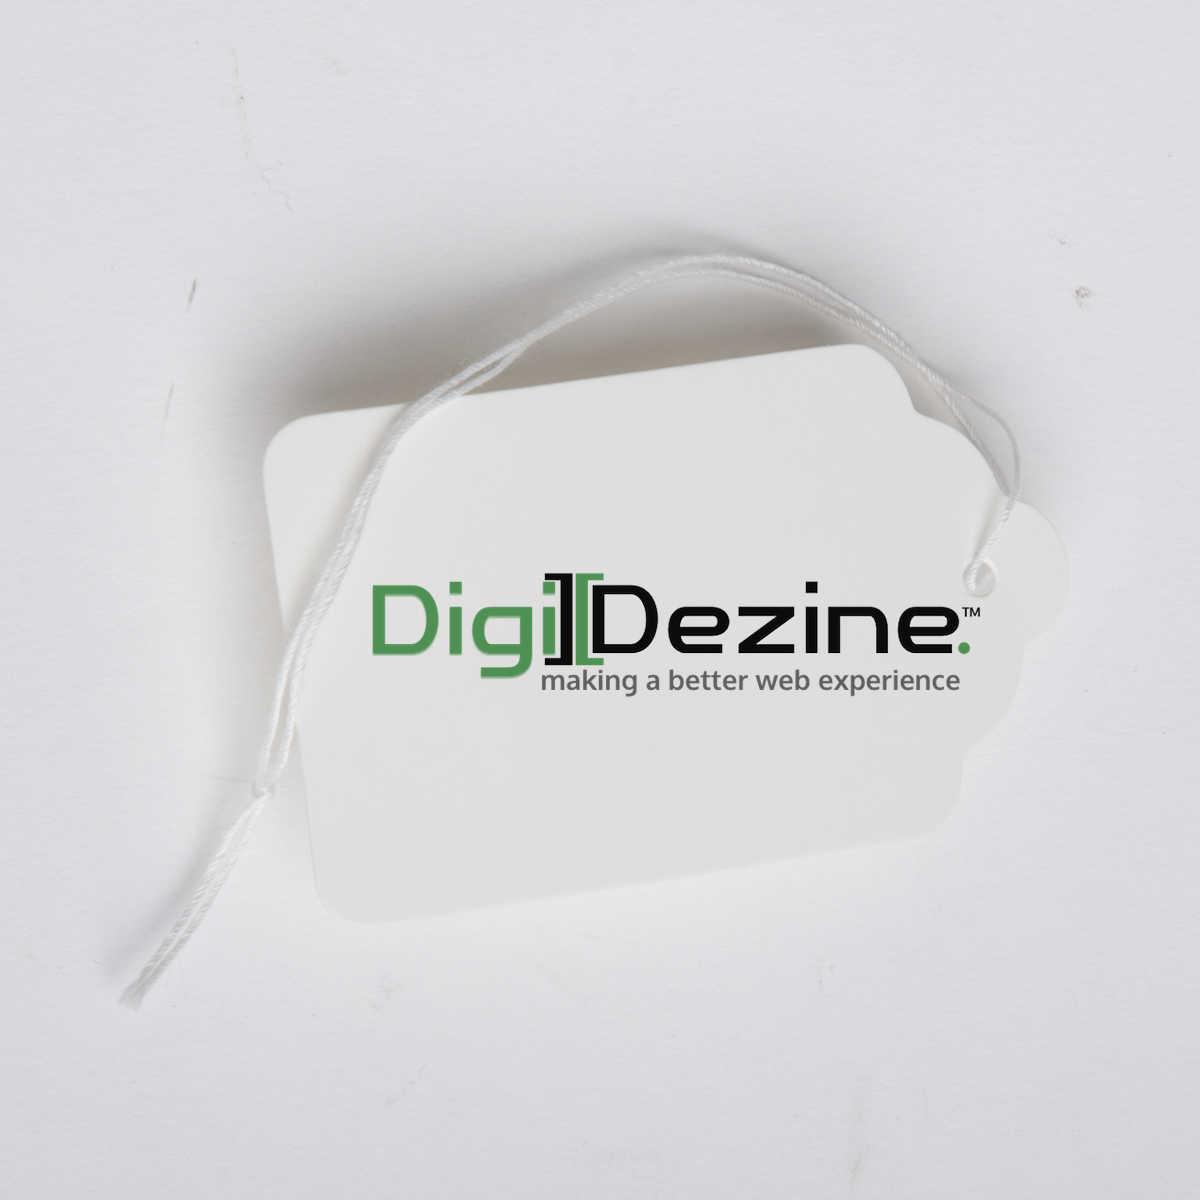 price tag image with logo of Digi Dezine web design agency in Las Vegas